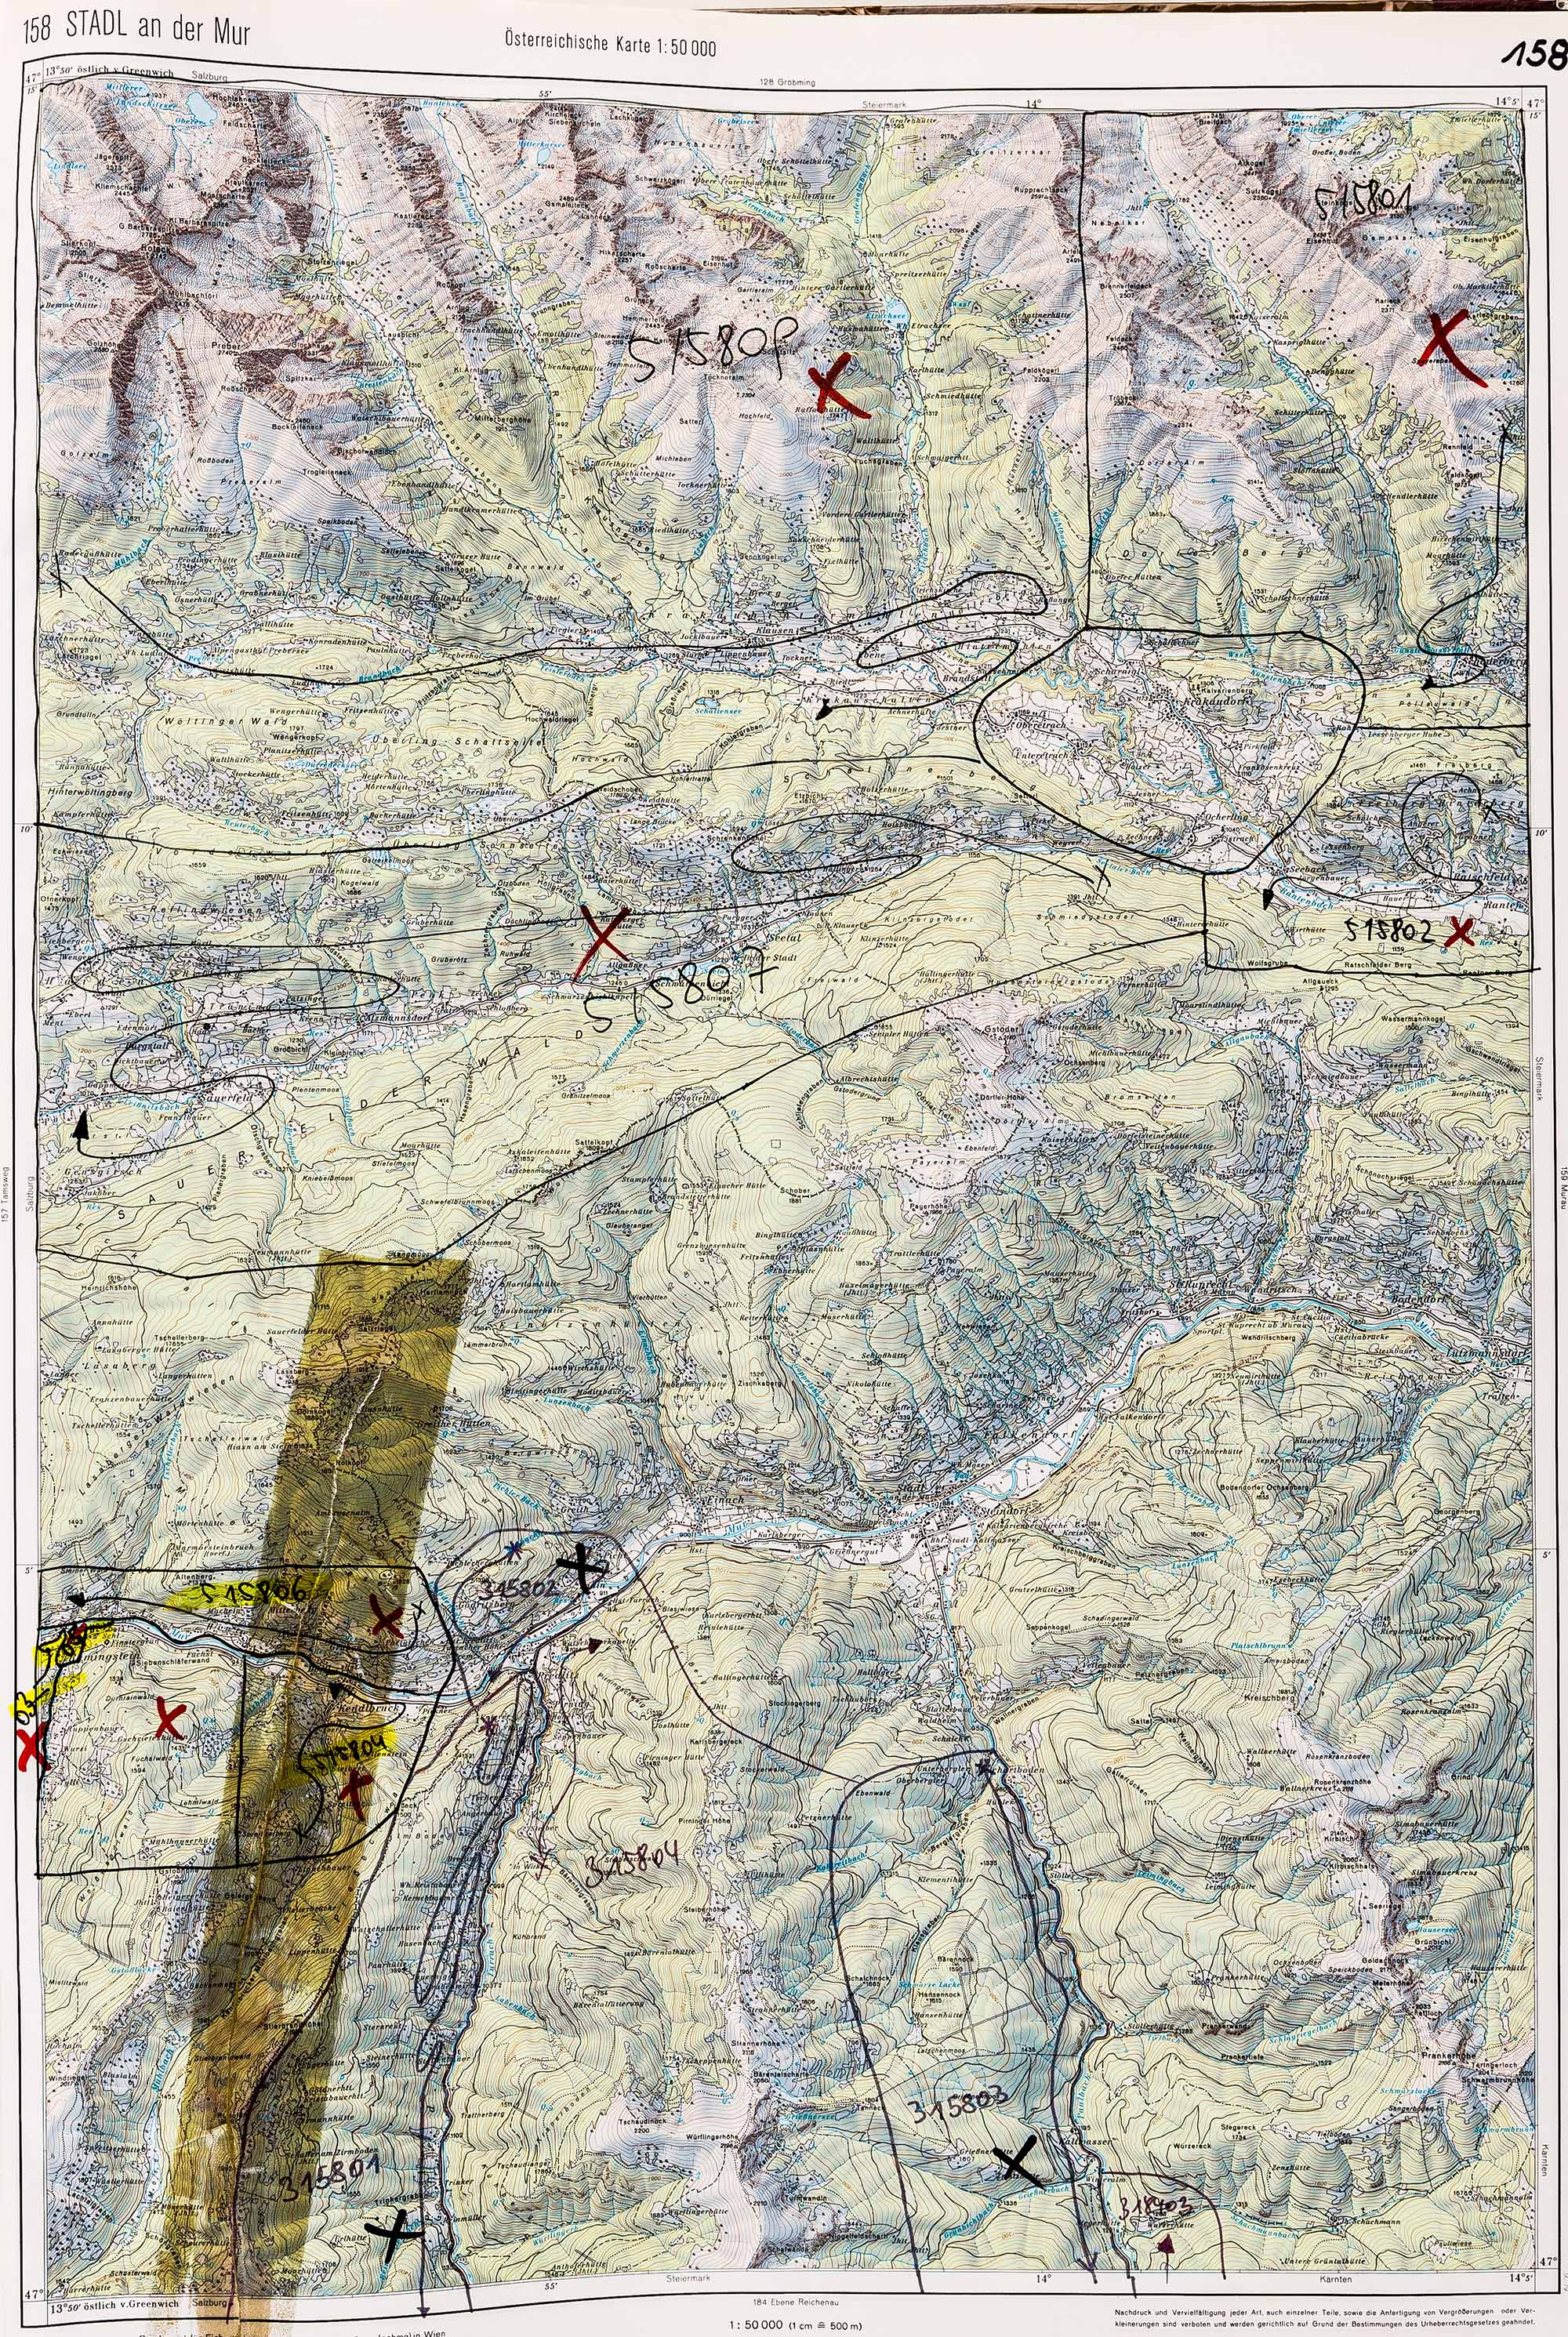 1983-1986 Karte 158